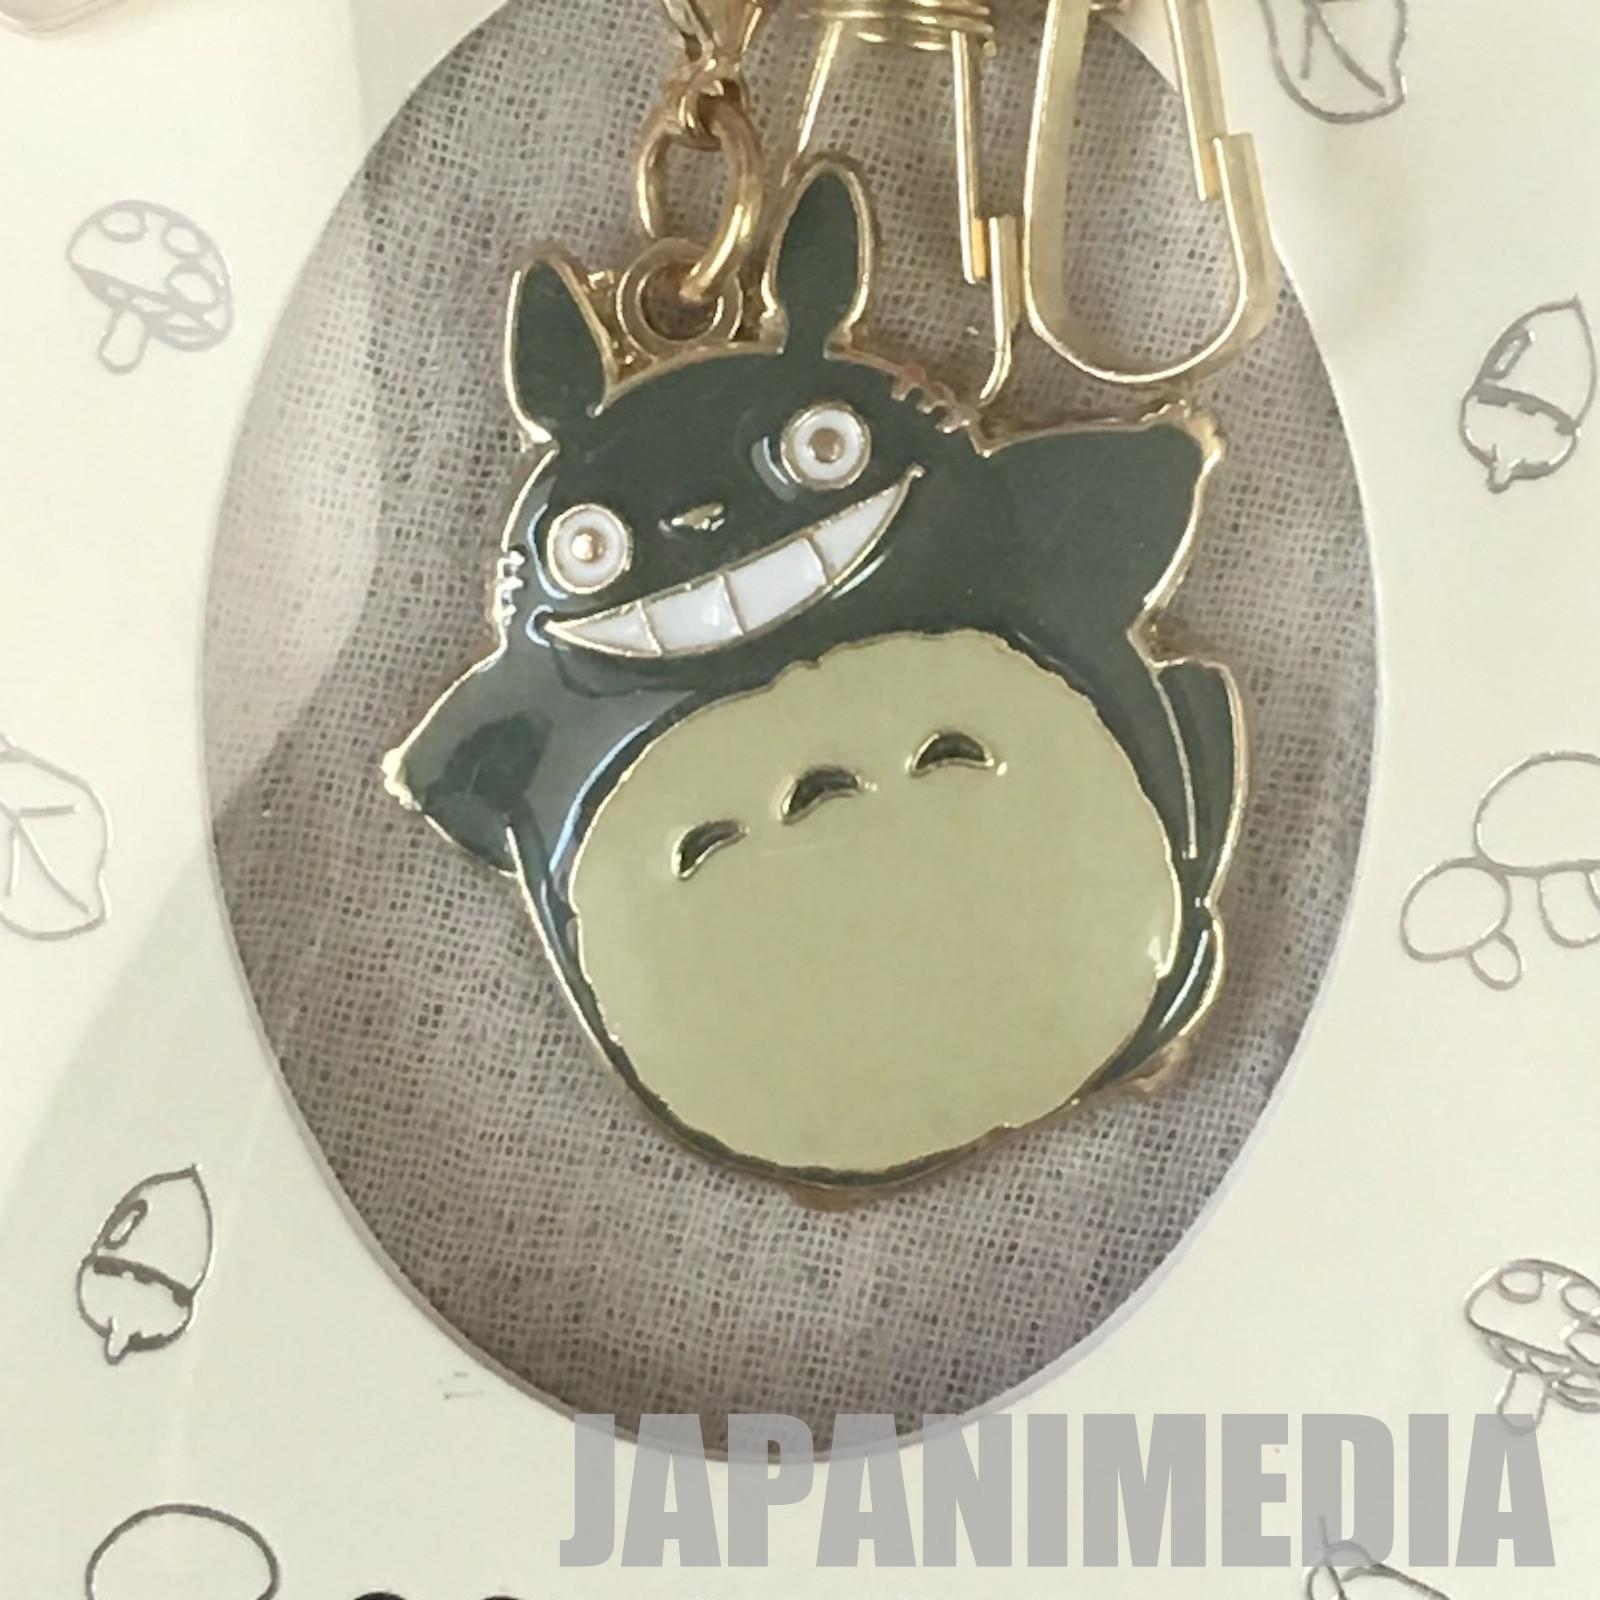 My Neighbor Totoro Mascot Charm Key Ring #2 Ghibli Hayao Miyazaki JAPAN